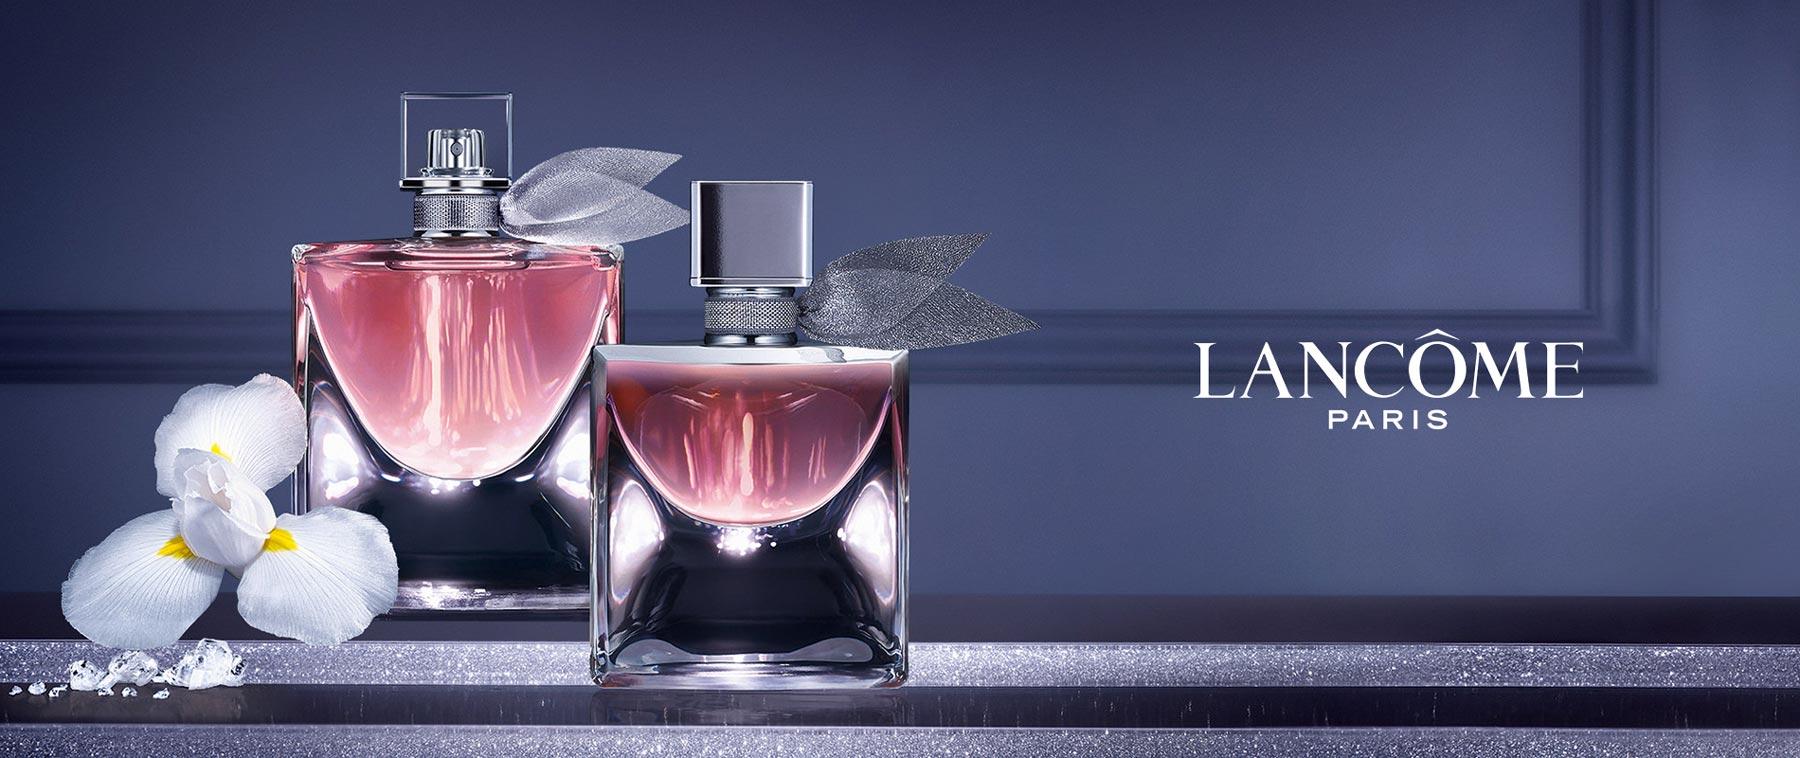 Lancôme - ShopLuxo